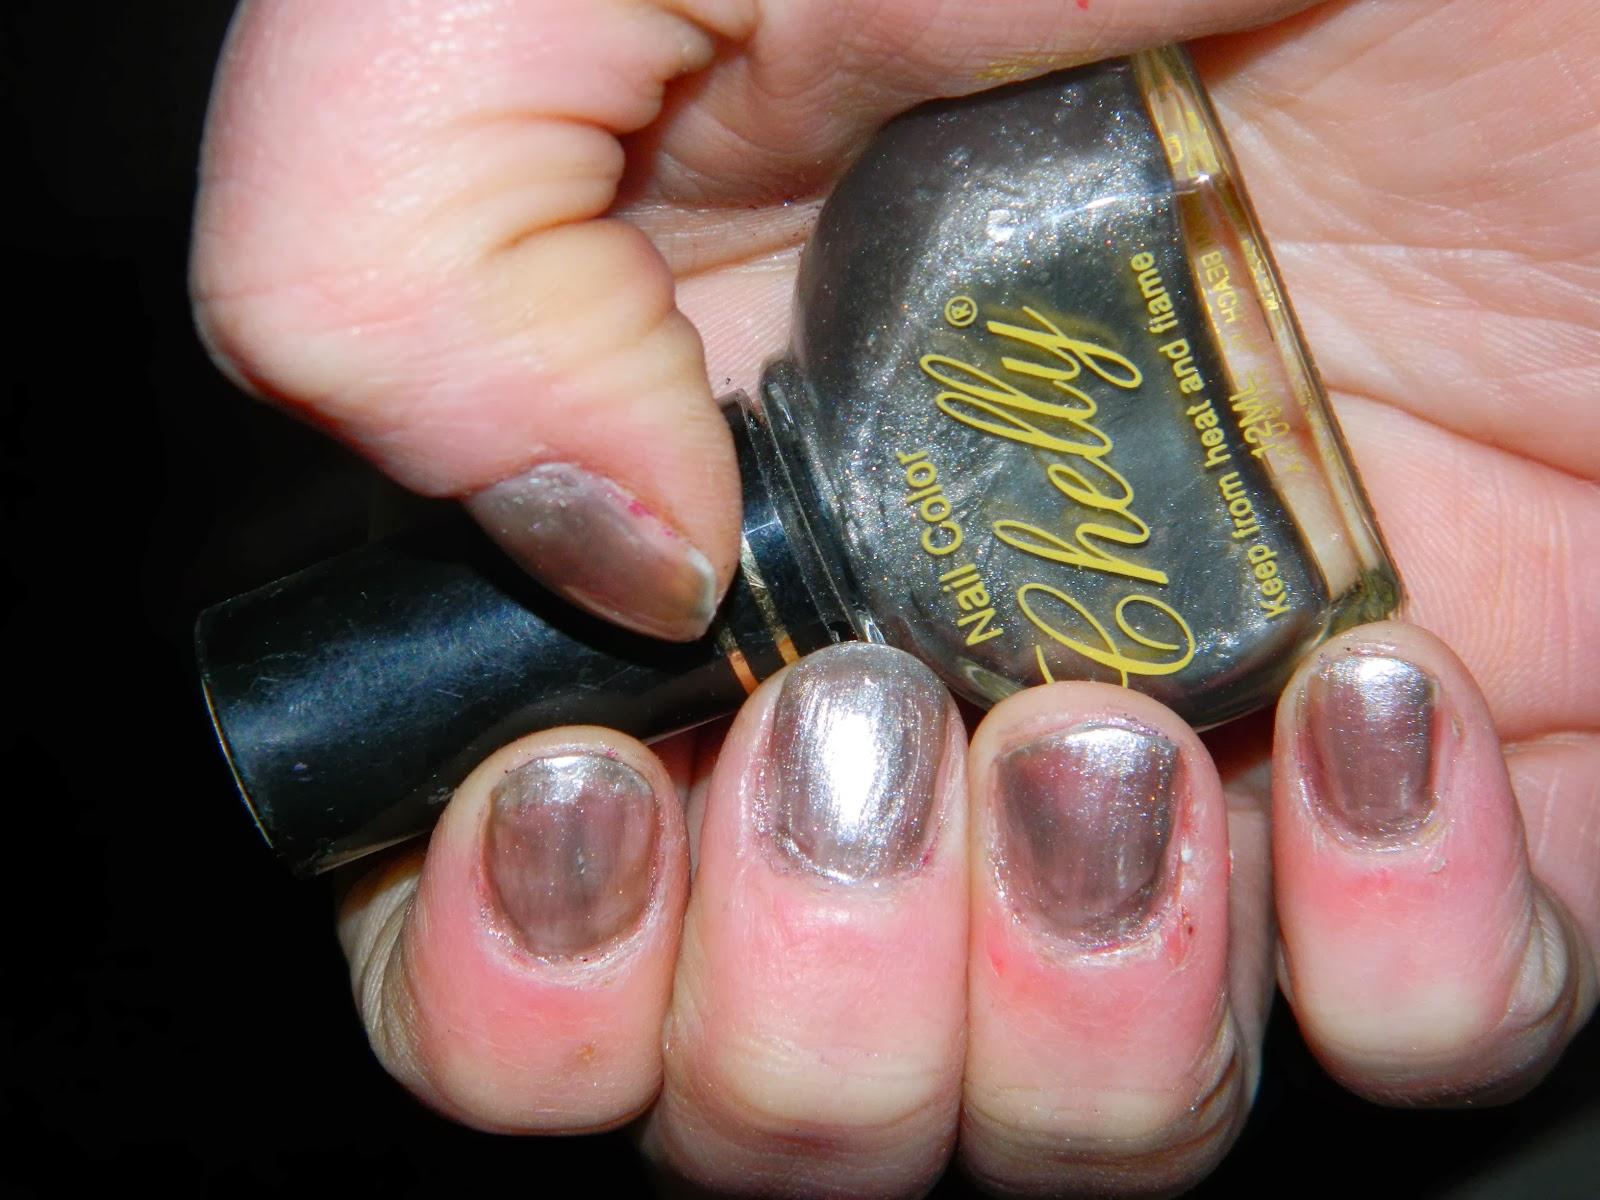 cutting edge polish : vintage nail polish from 1990s- 2002